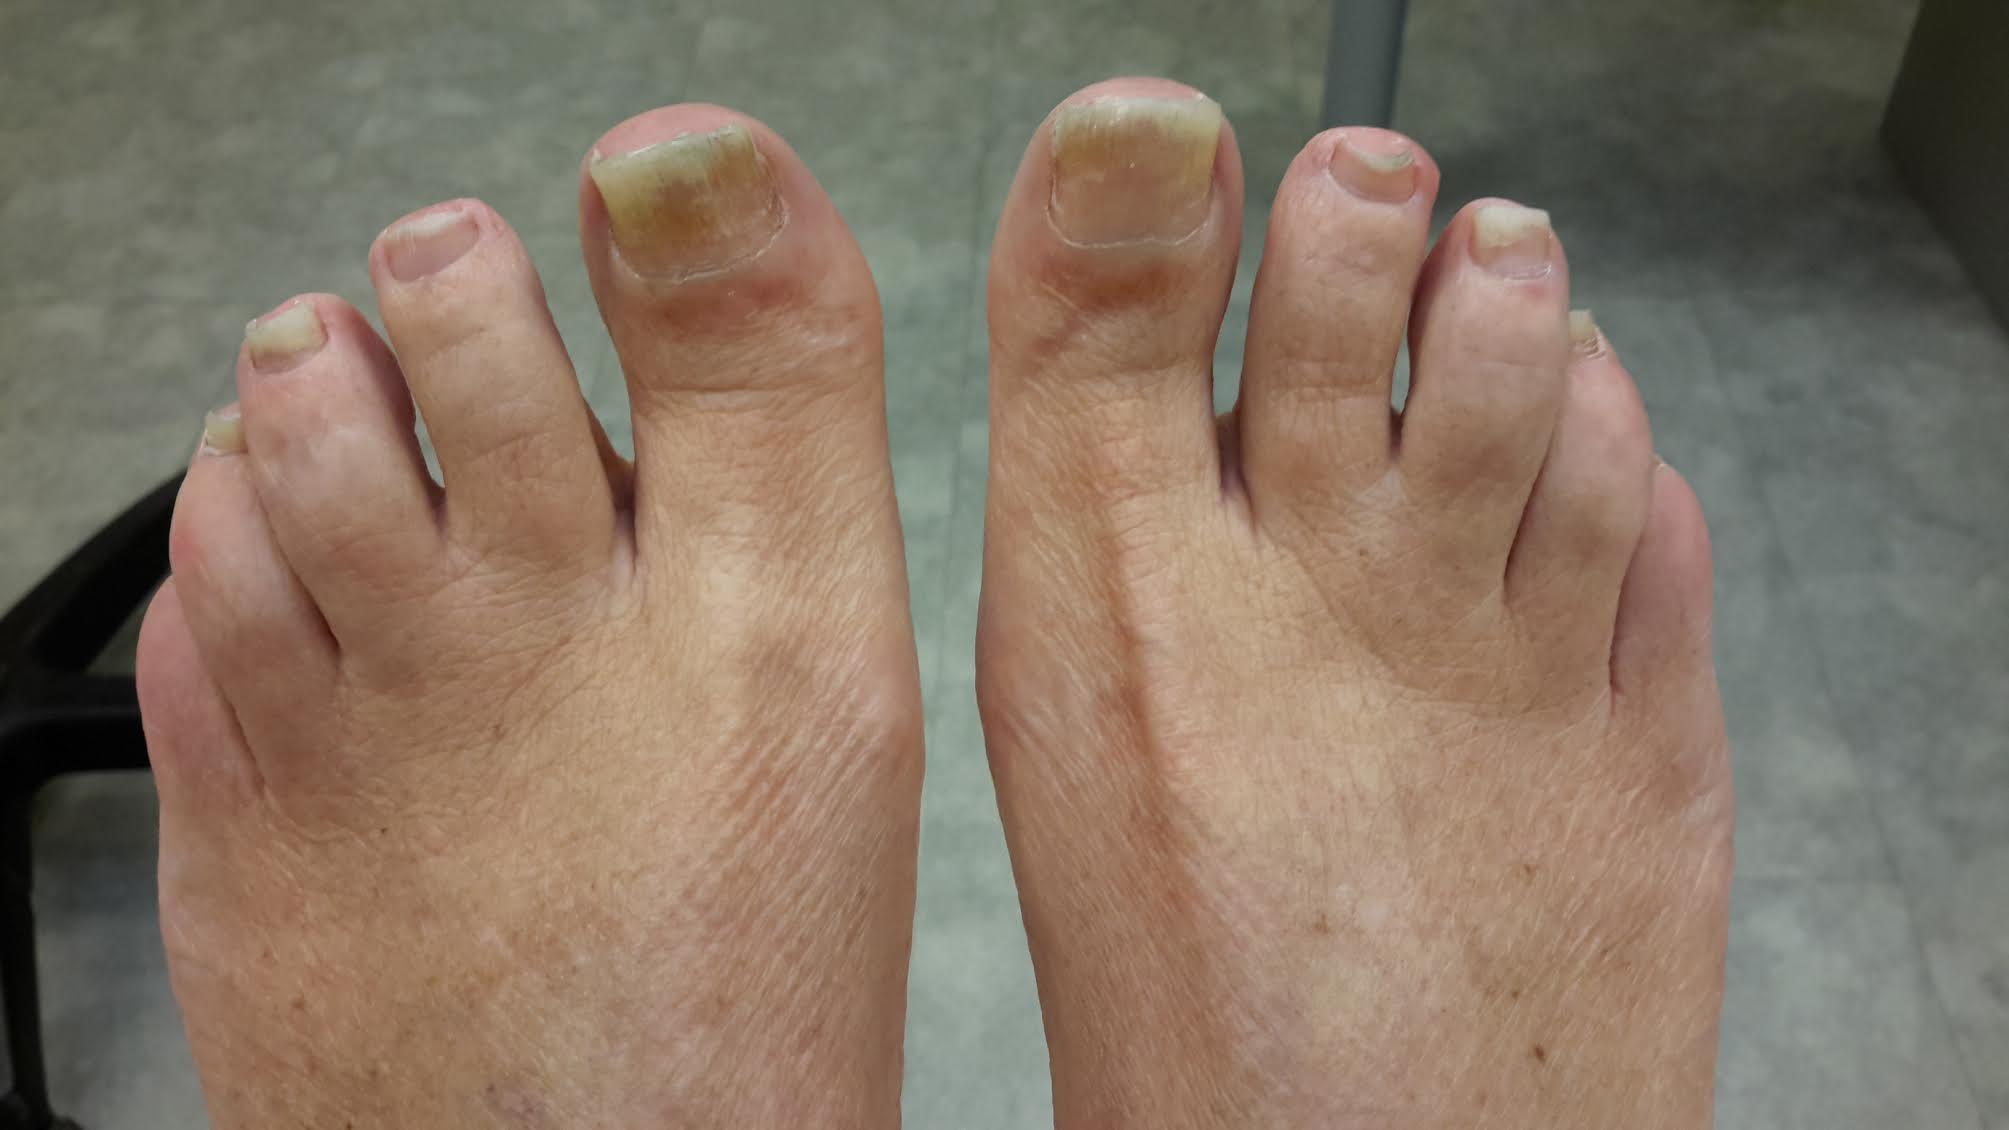 artritis psoriatica voeten